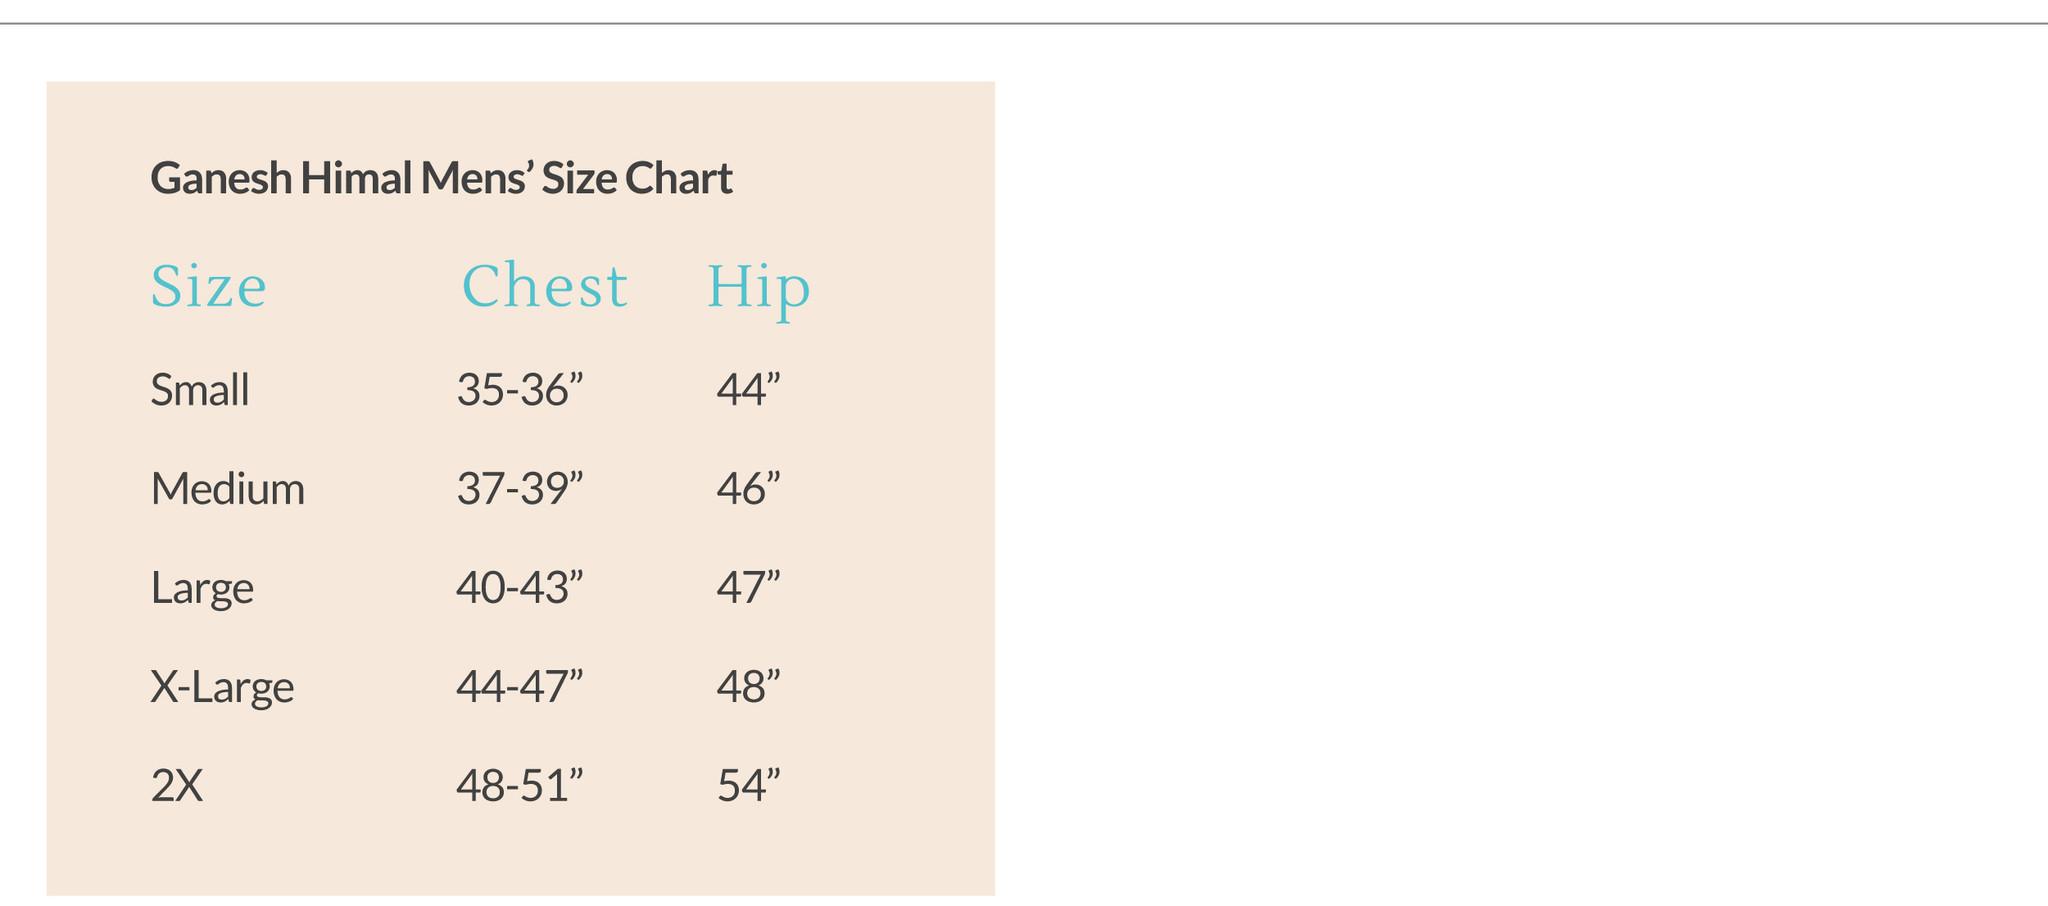 Ganesh Himal Men's Size Chart